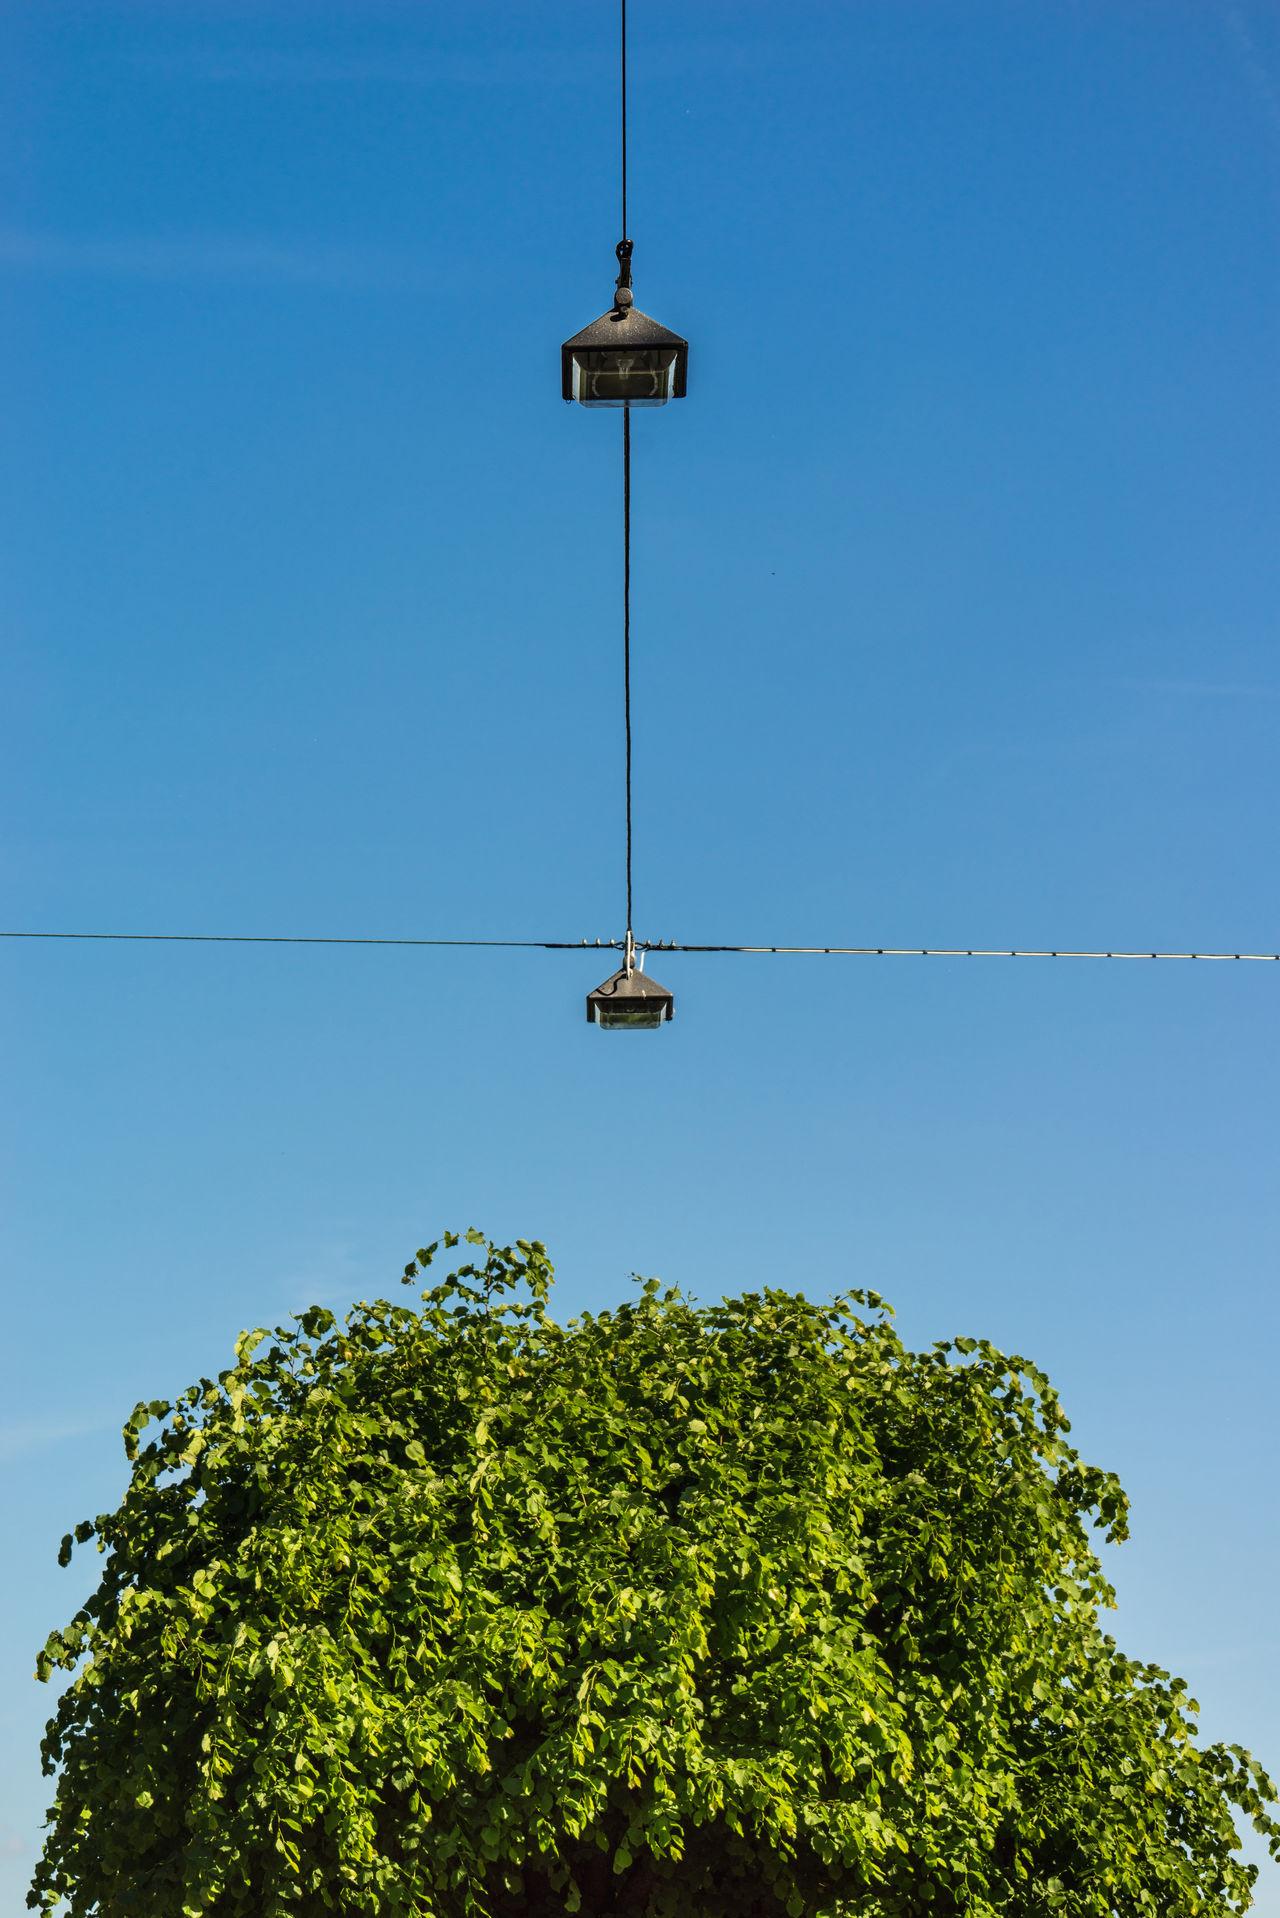 Art Blue Sky Daylight Lamp Minimalistic Nature Still Life Tree